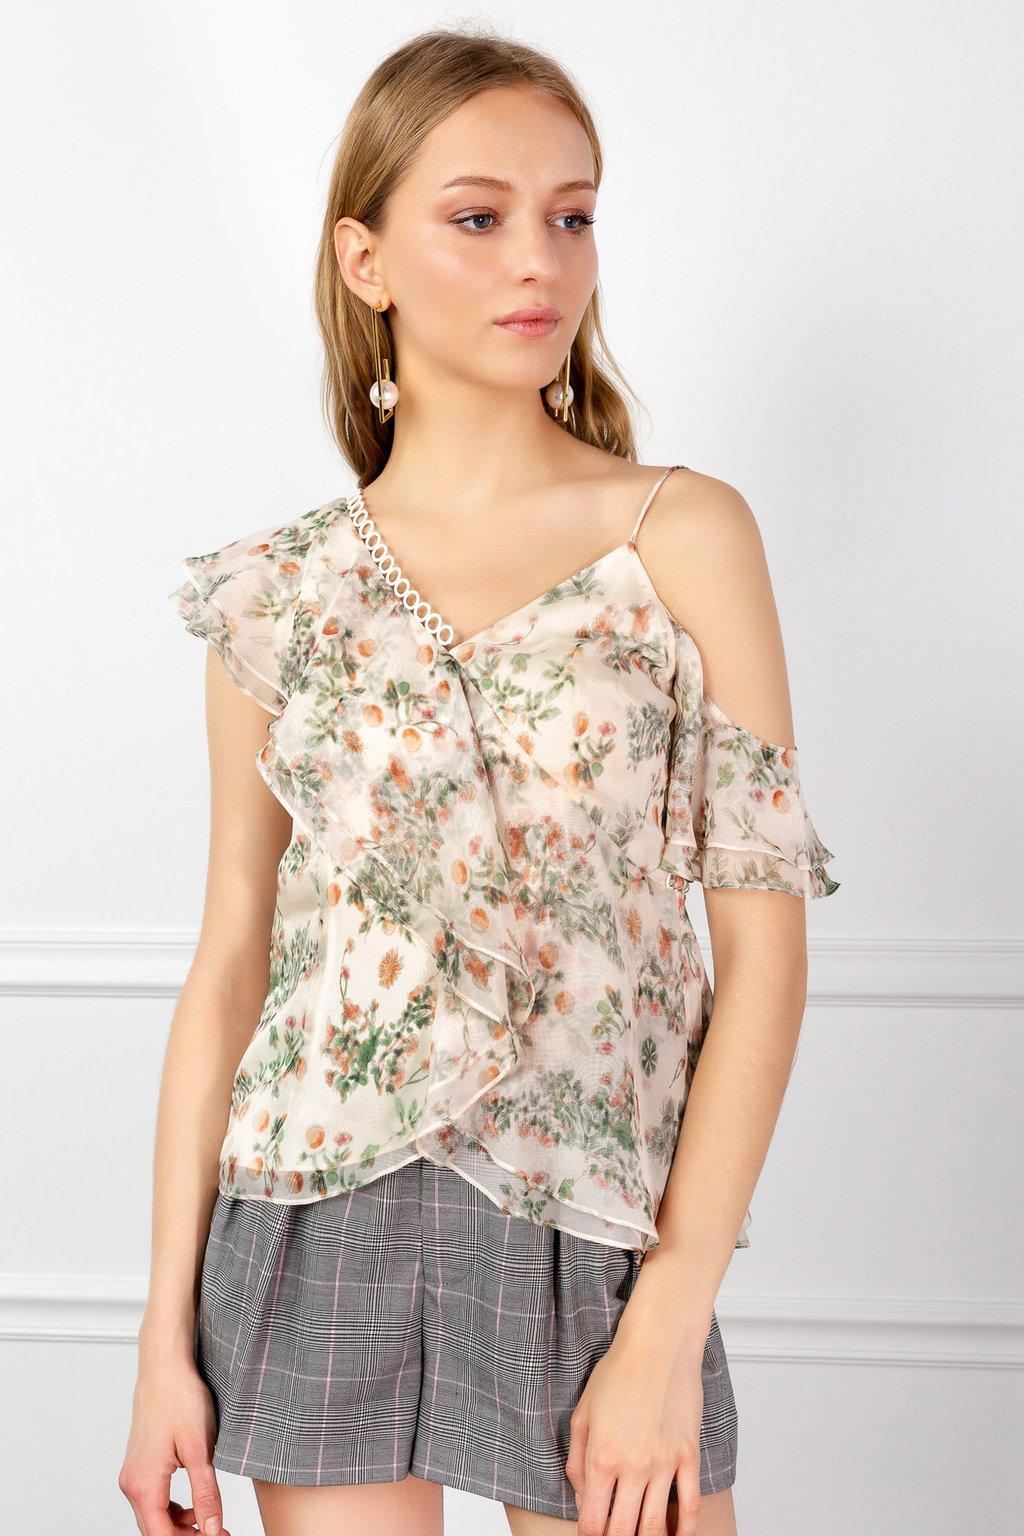 Hazel Floral Blouse by J.ING women's fashion clothing